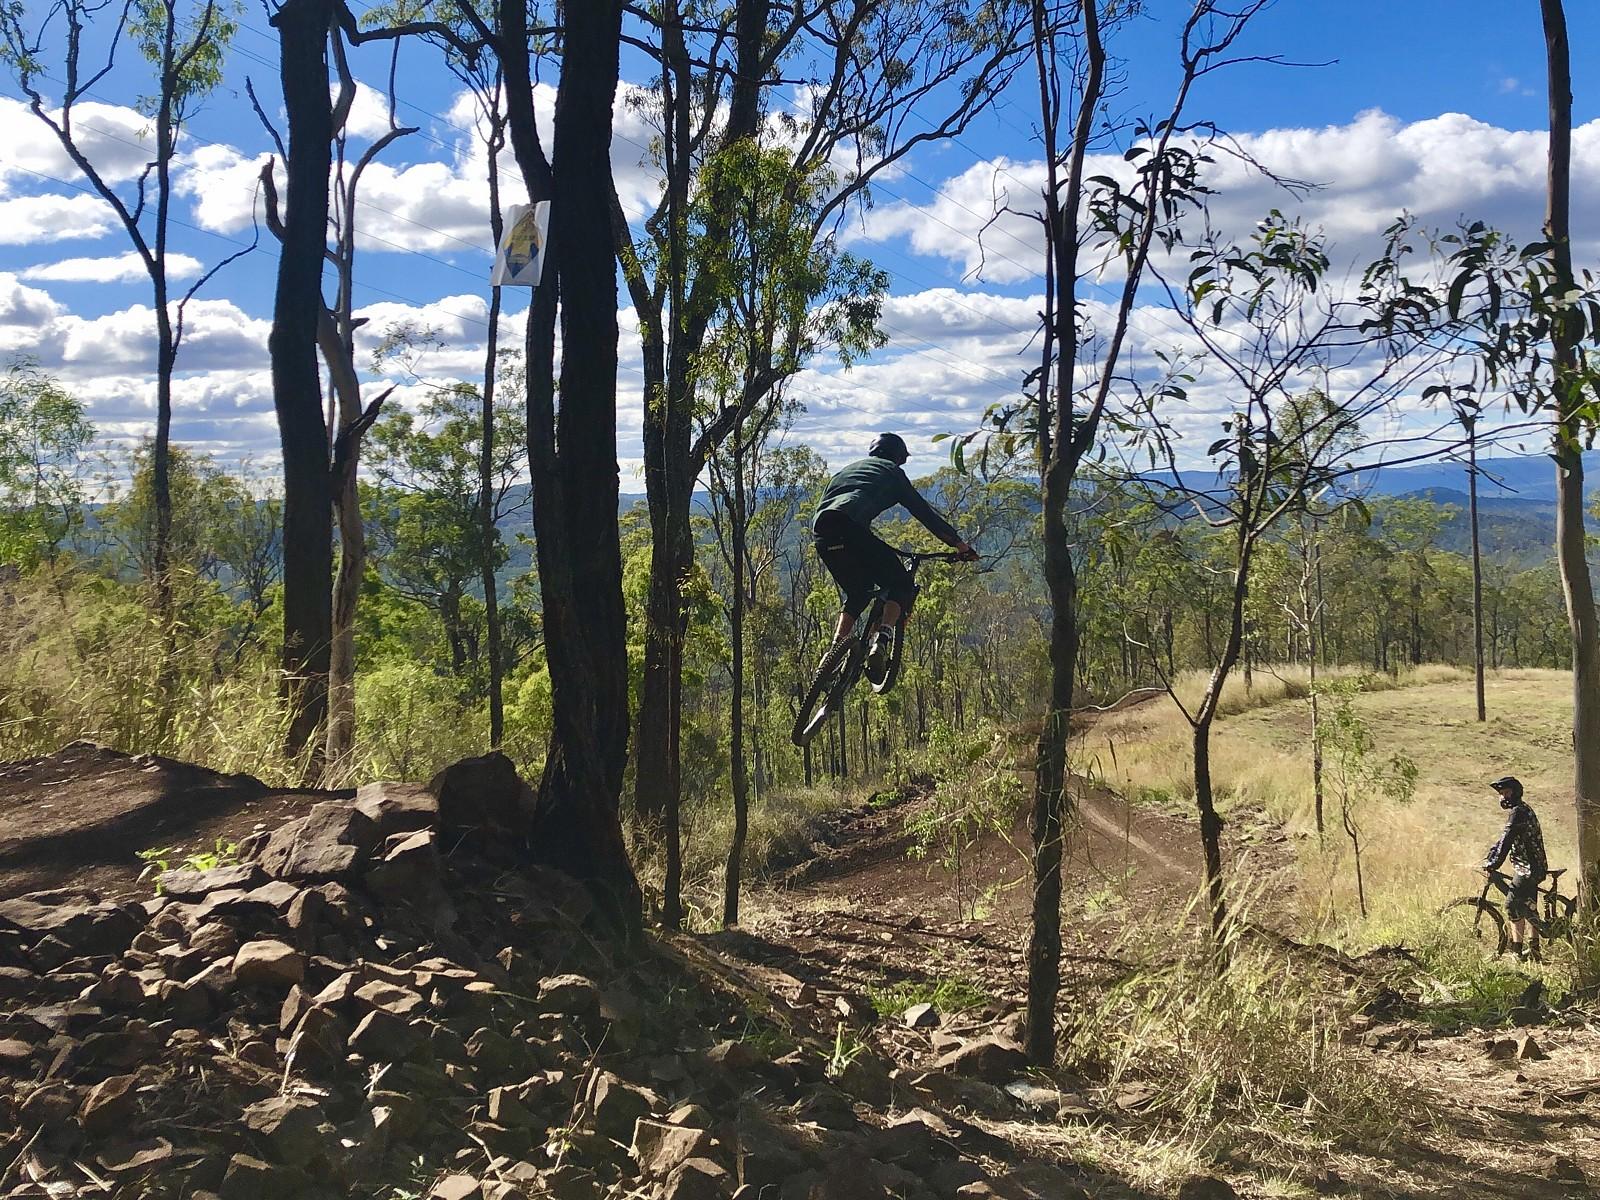 Toowoomba sends  - BoostinSimmo - Mountain Biking Pictures - Vital MTB